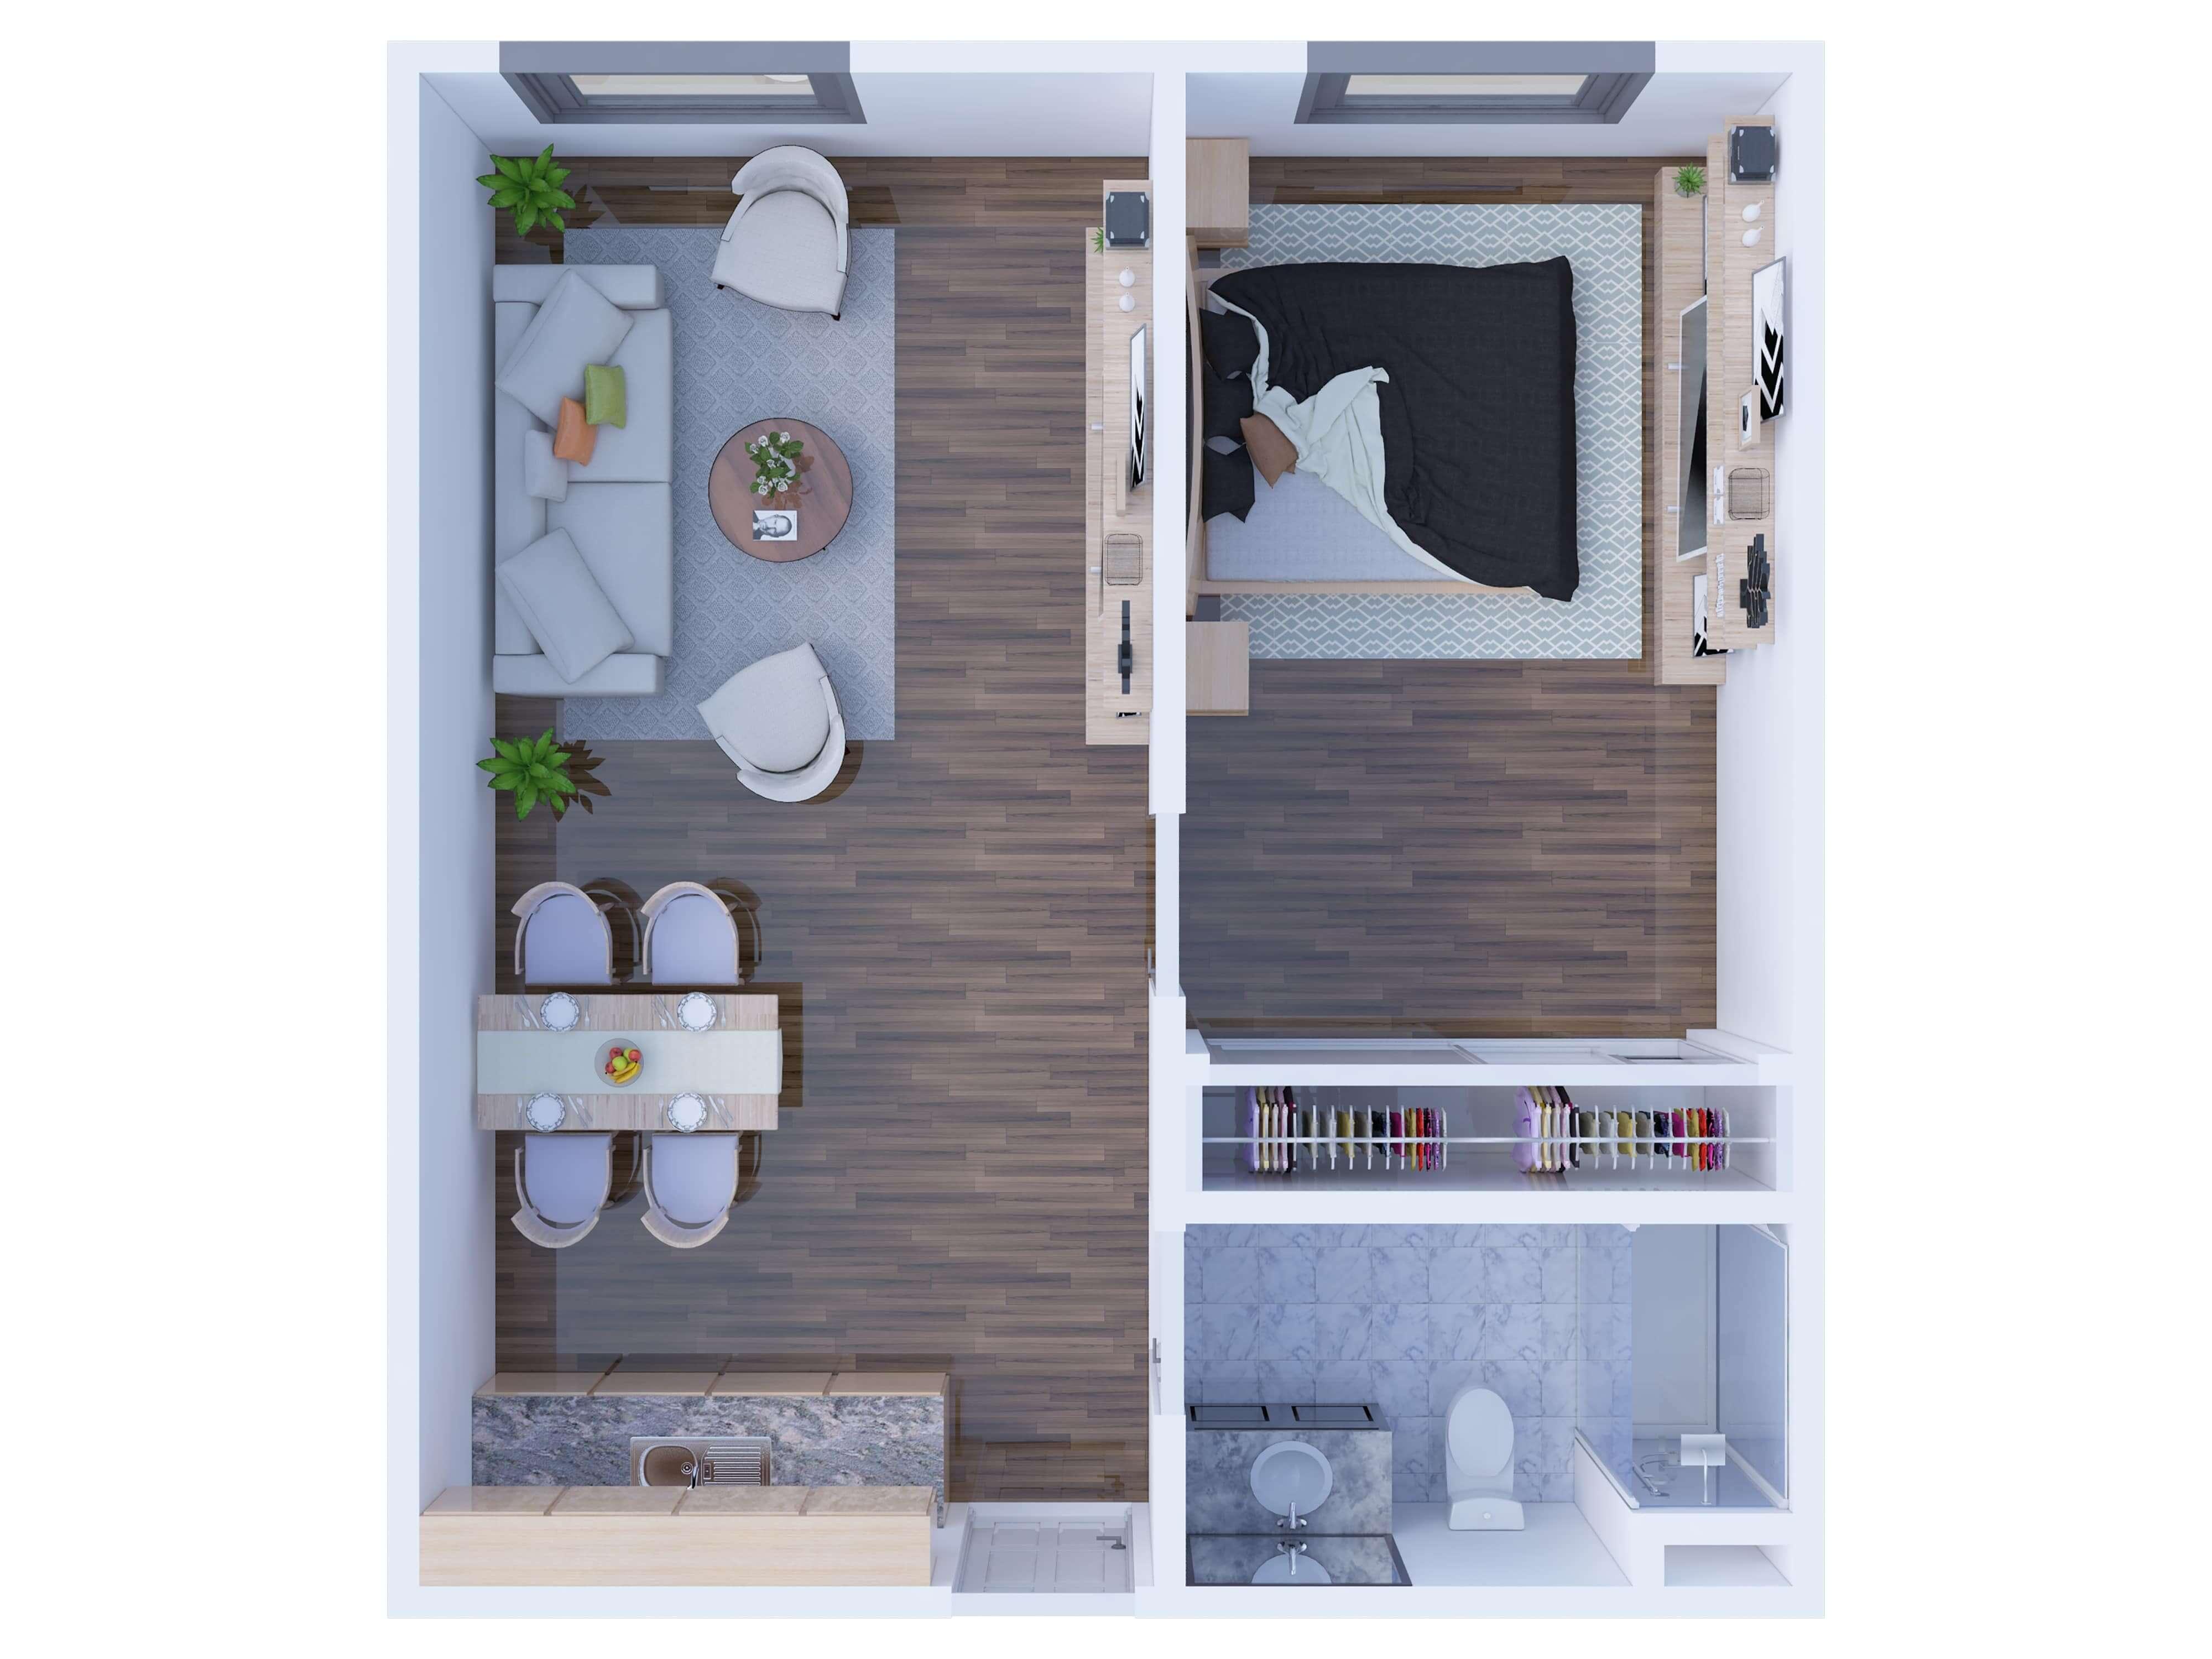 3D Floor Plan Sample - Std Quality